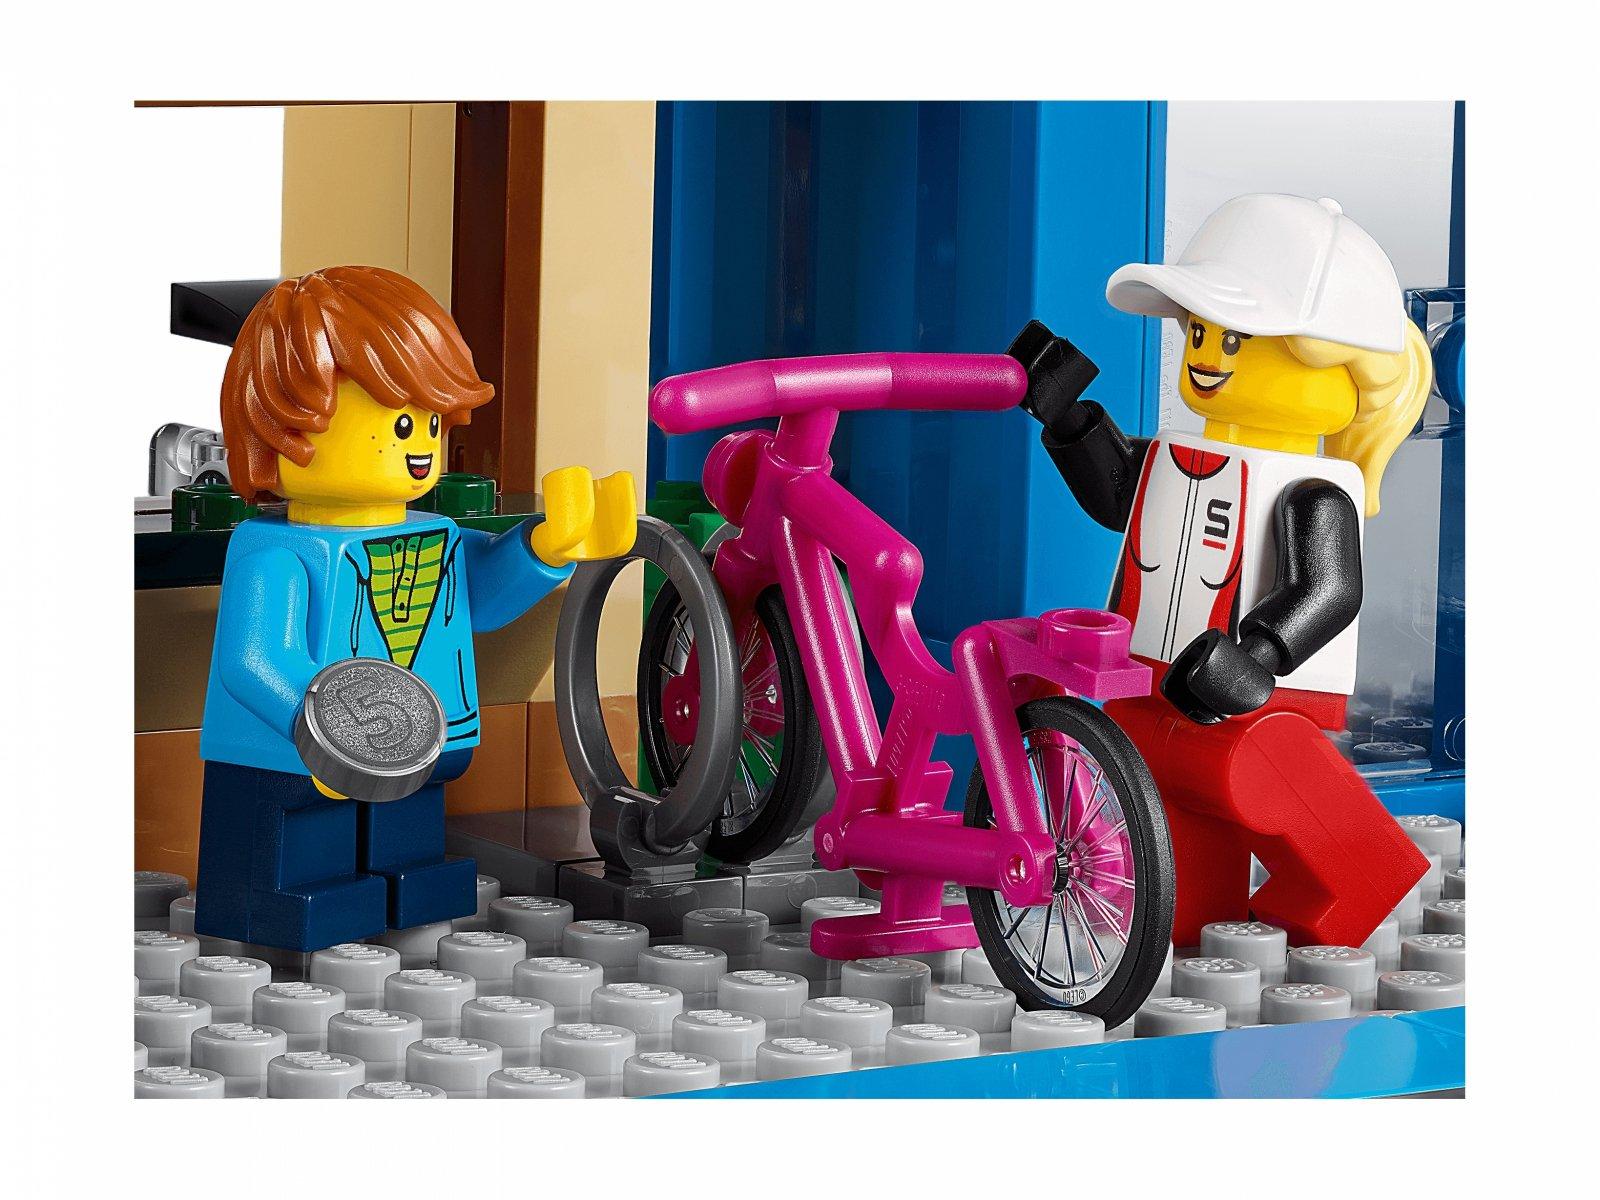 LEGO City Ulica handlowa 60306